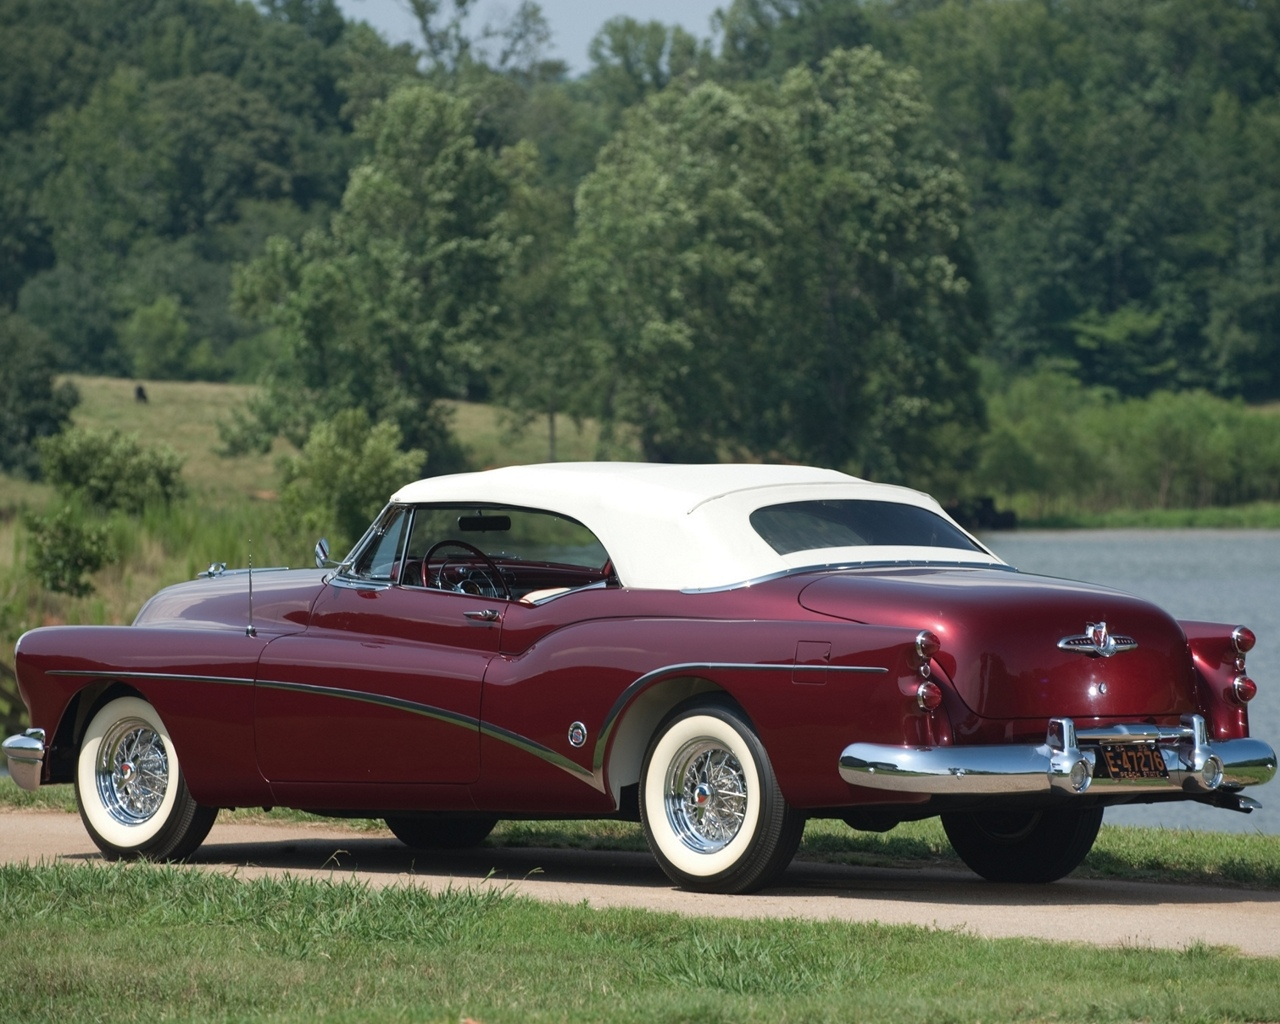 American Classic Cars Wallpapers amazingmaterial 1280x1024